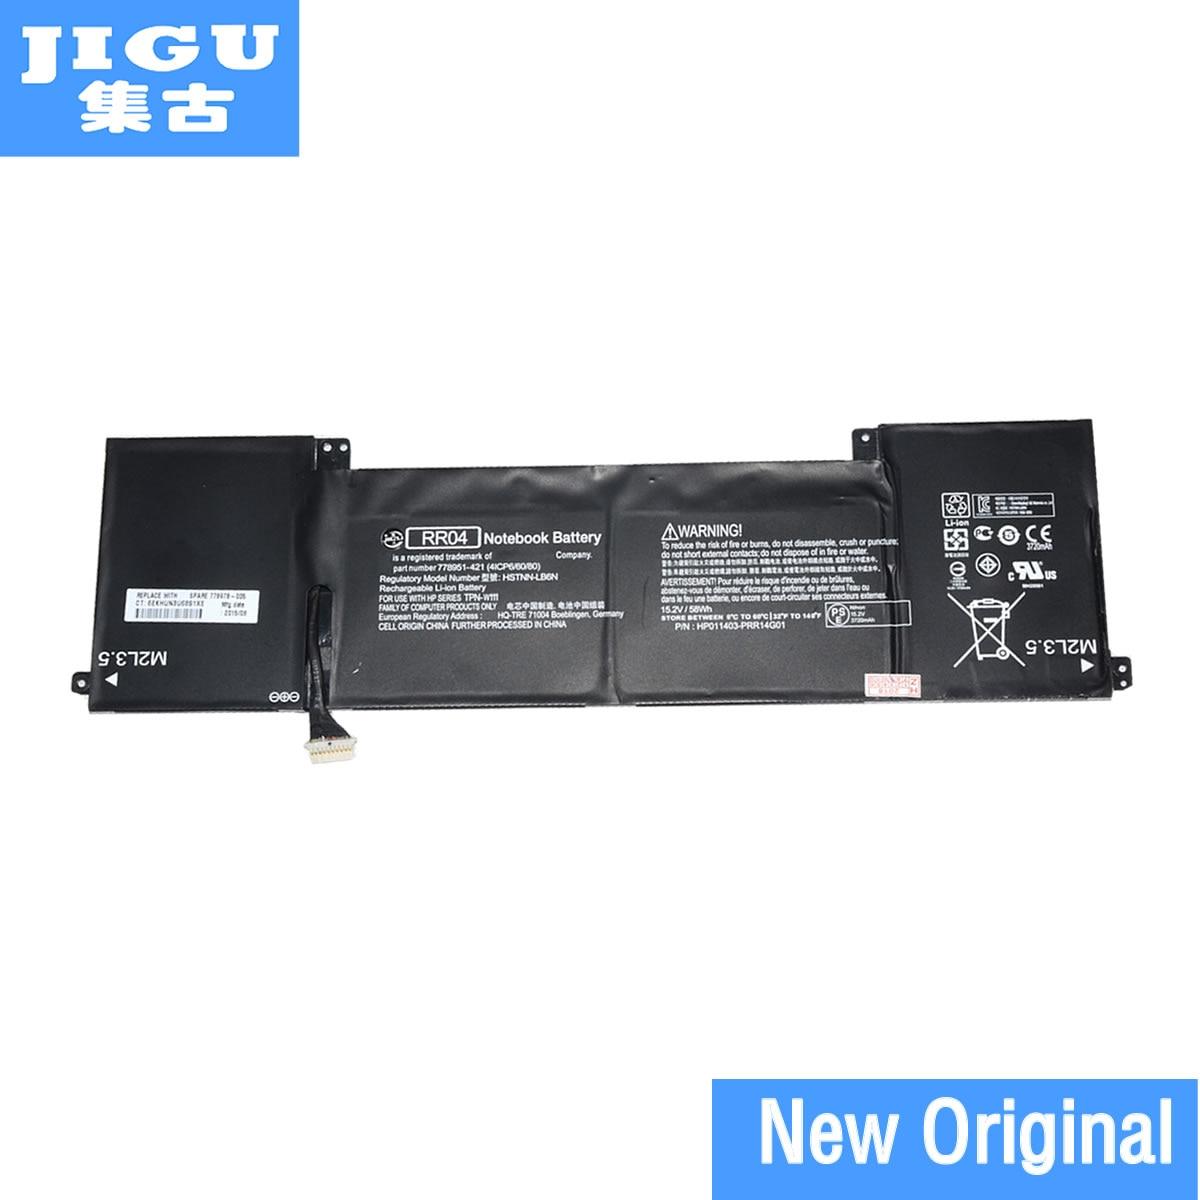 Оригинальная Аккумуляторная Батарея JIGU для ноутбука 778951-421 778961-421 778978-005 HSTNN-LB6N RR04 для ноутбука HP Omen 15 15-5116TX